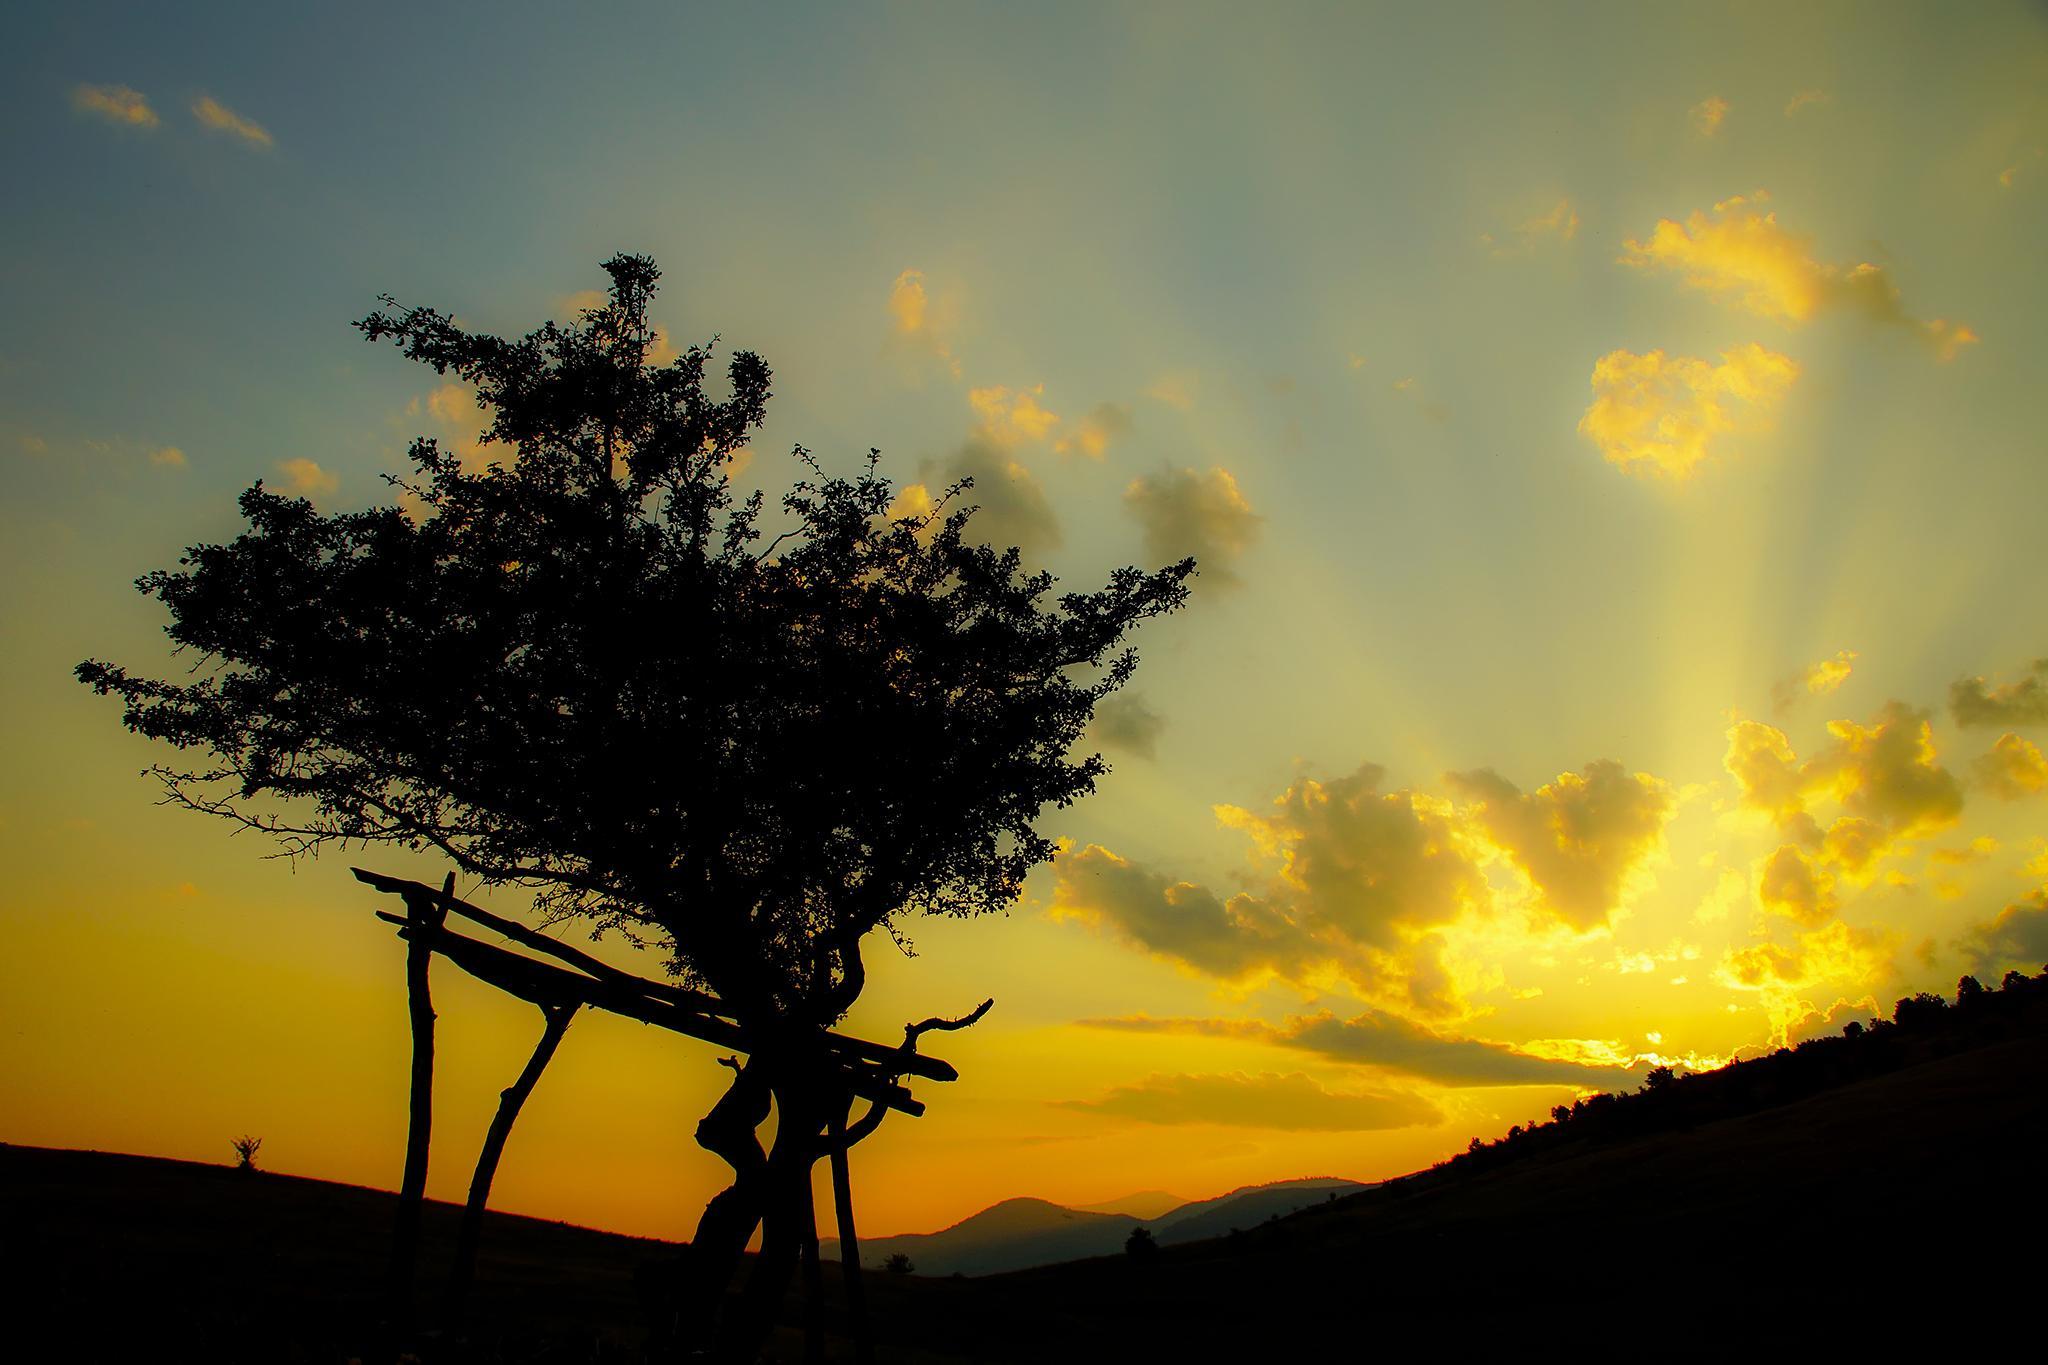 Sunset by mugurelcm